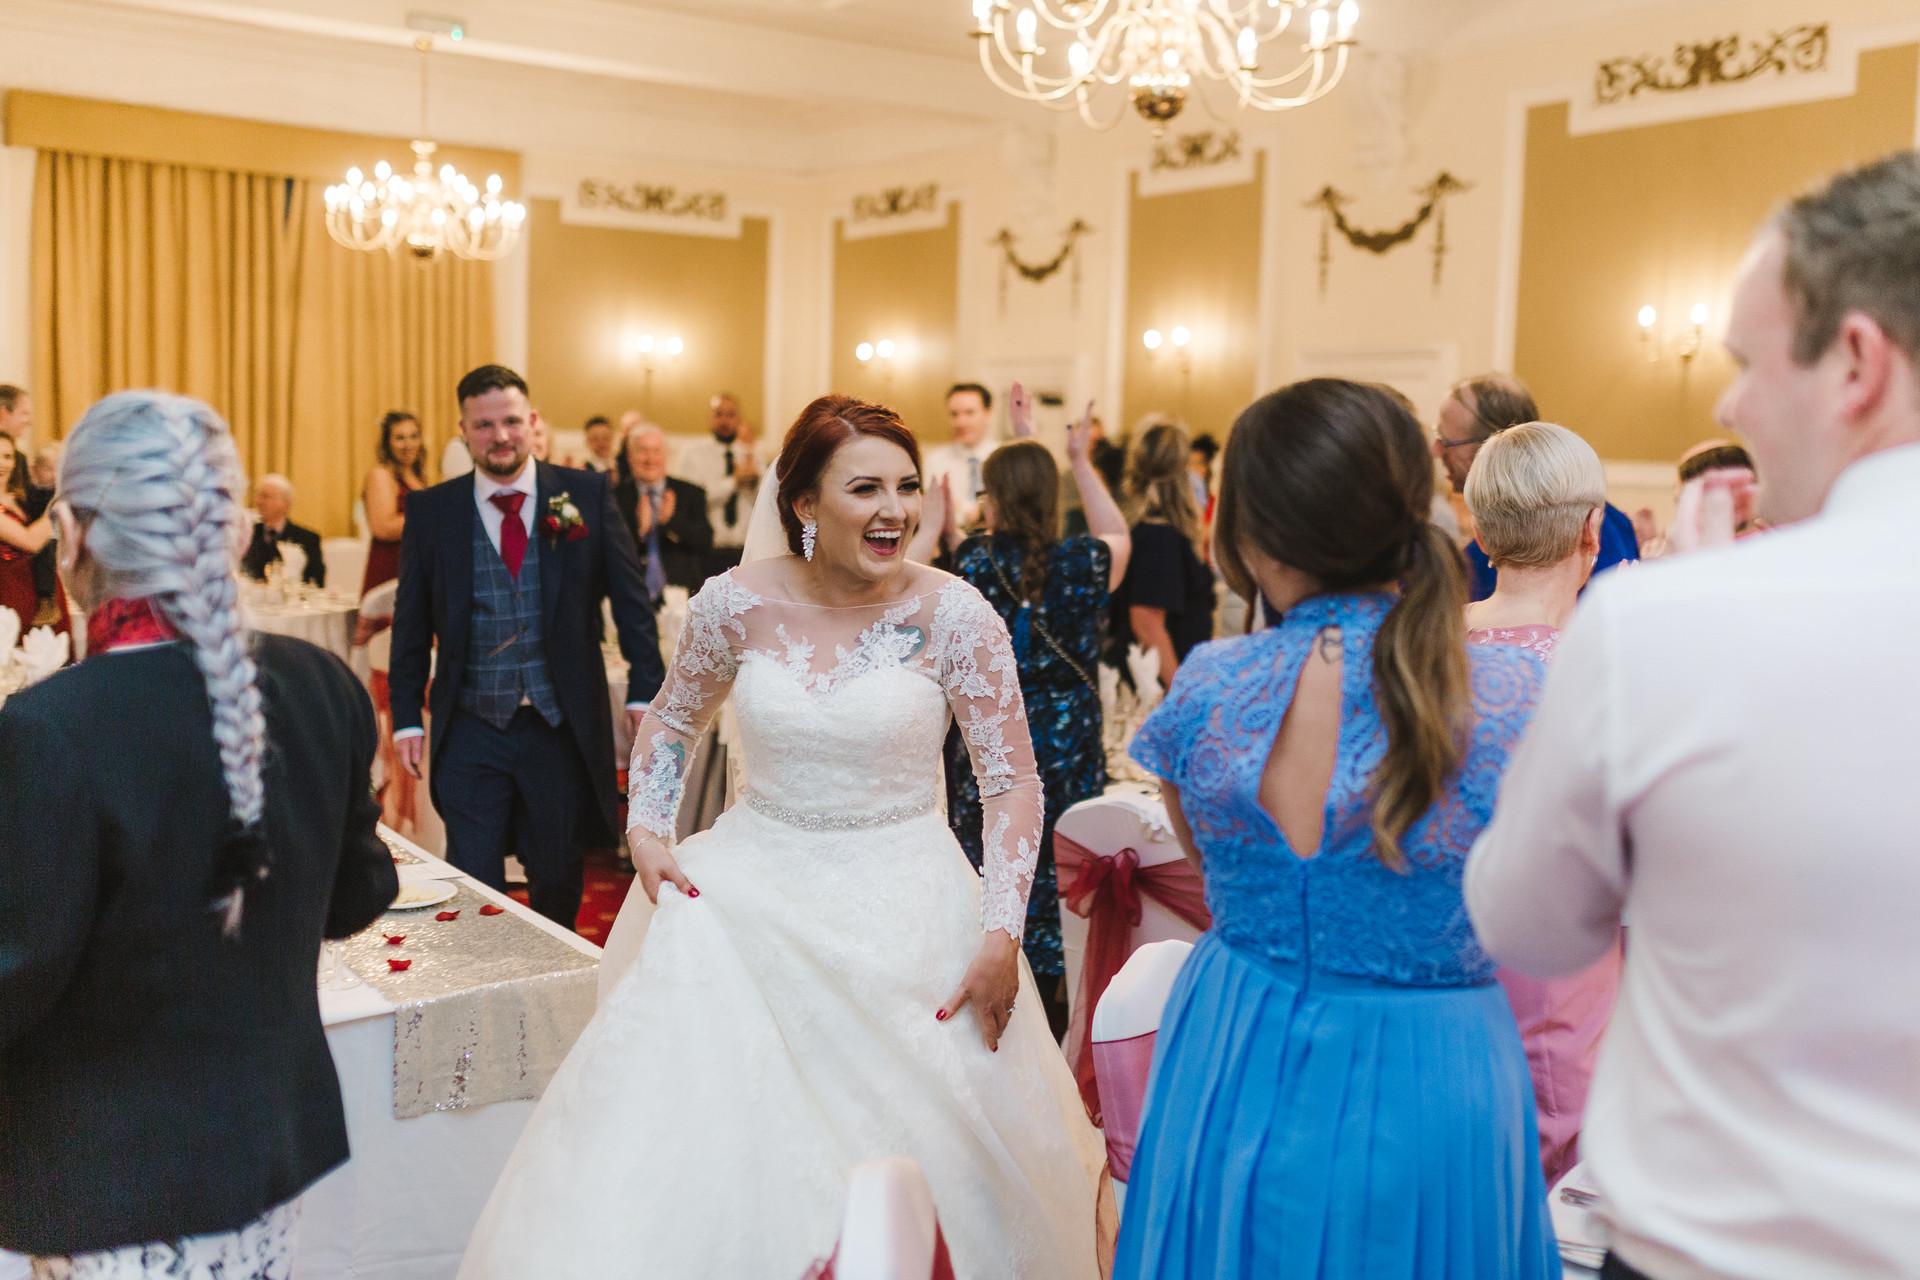 ilkley-west-yorkshire-wedding-148.jpg